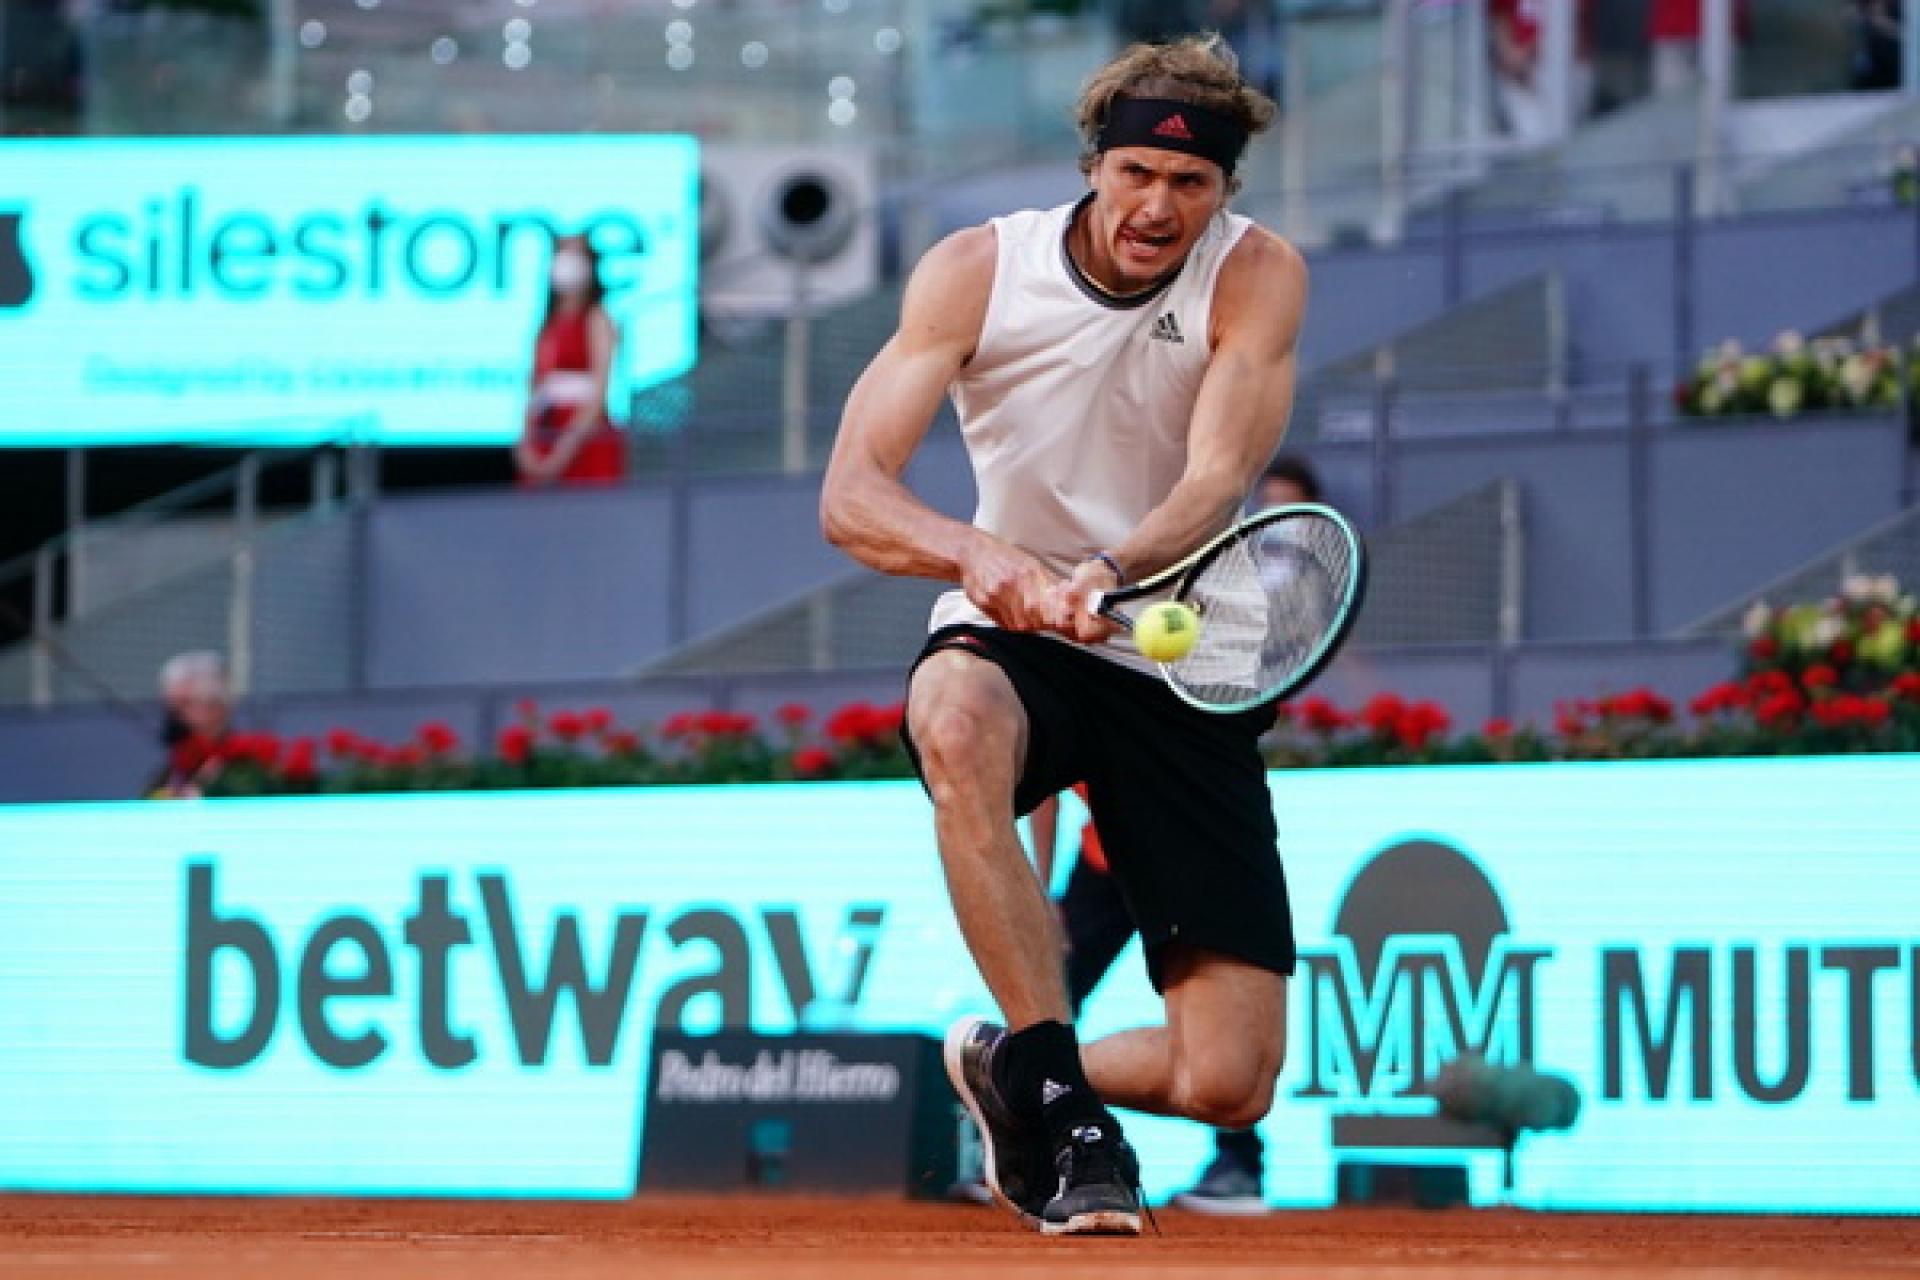 Madrid Open 2021: Dominic Thiem vs. Alexander Zverev Tennis Pick and Prediction